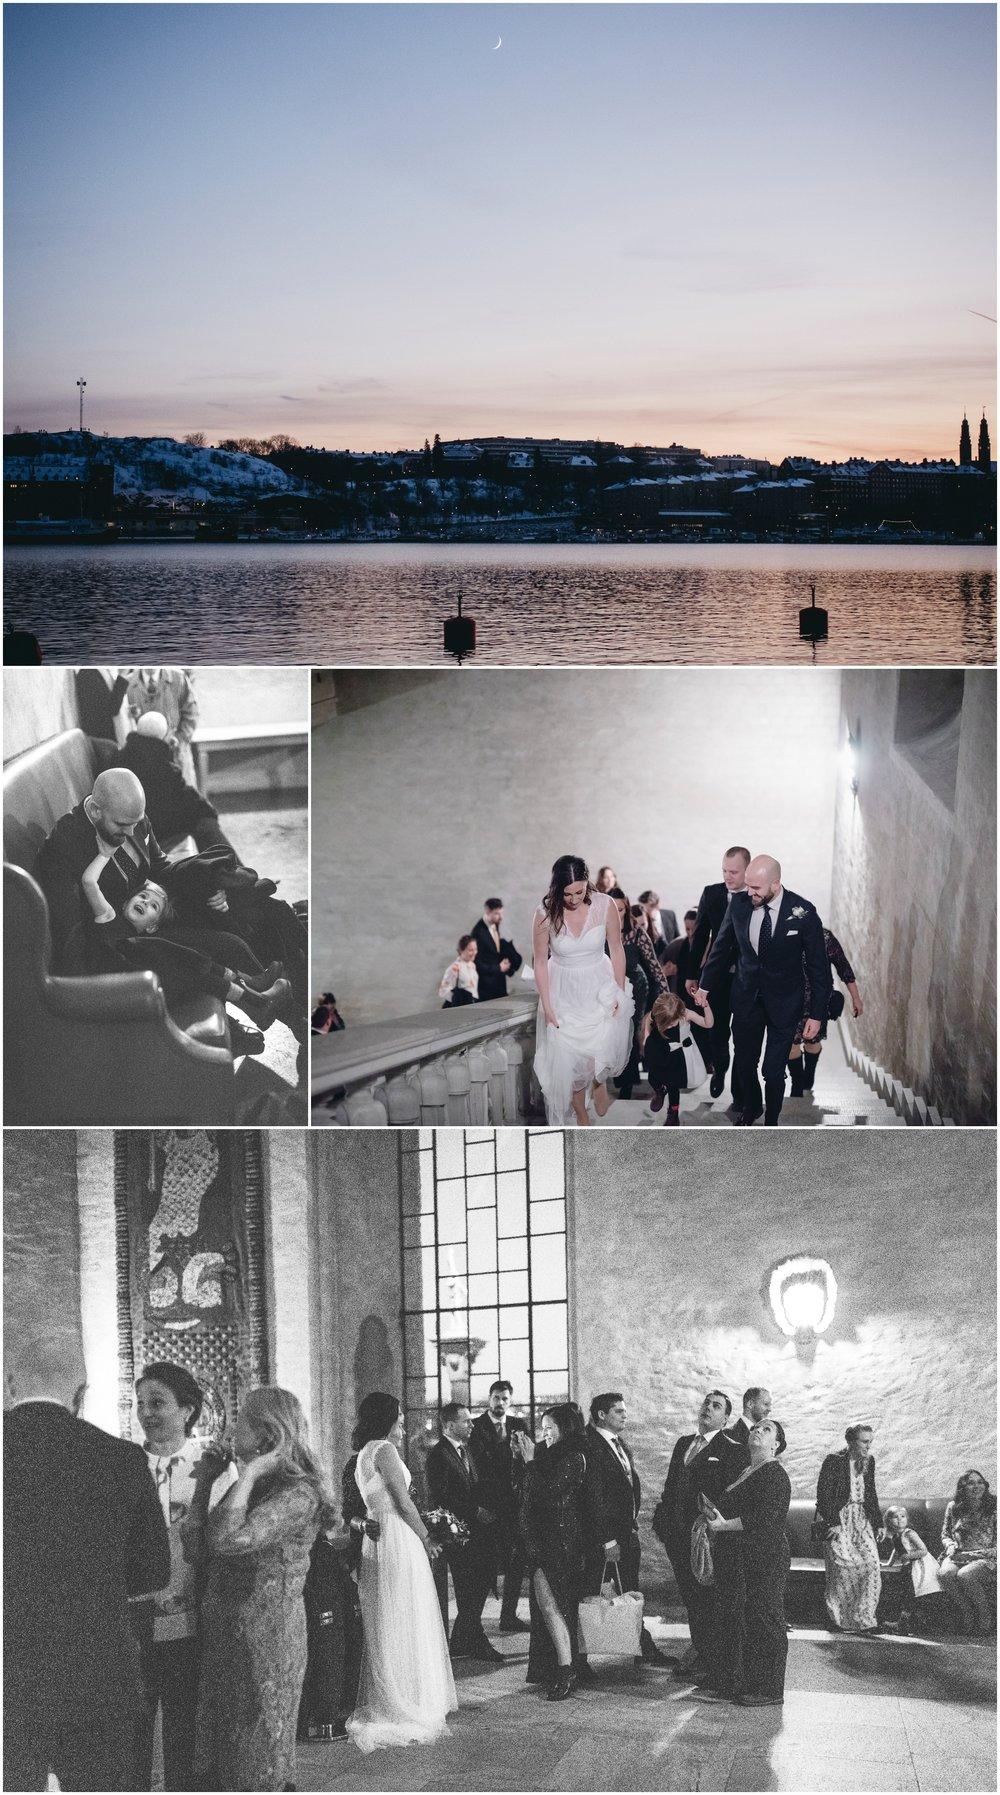 rollopsfotograf stadshuset stockholm_brollop i stadshuset_vigsel i stadshuset_borgerlig vigsel_linda rehlin_cecilia pihl_